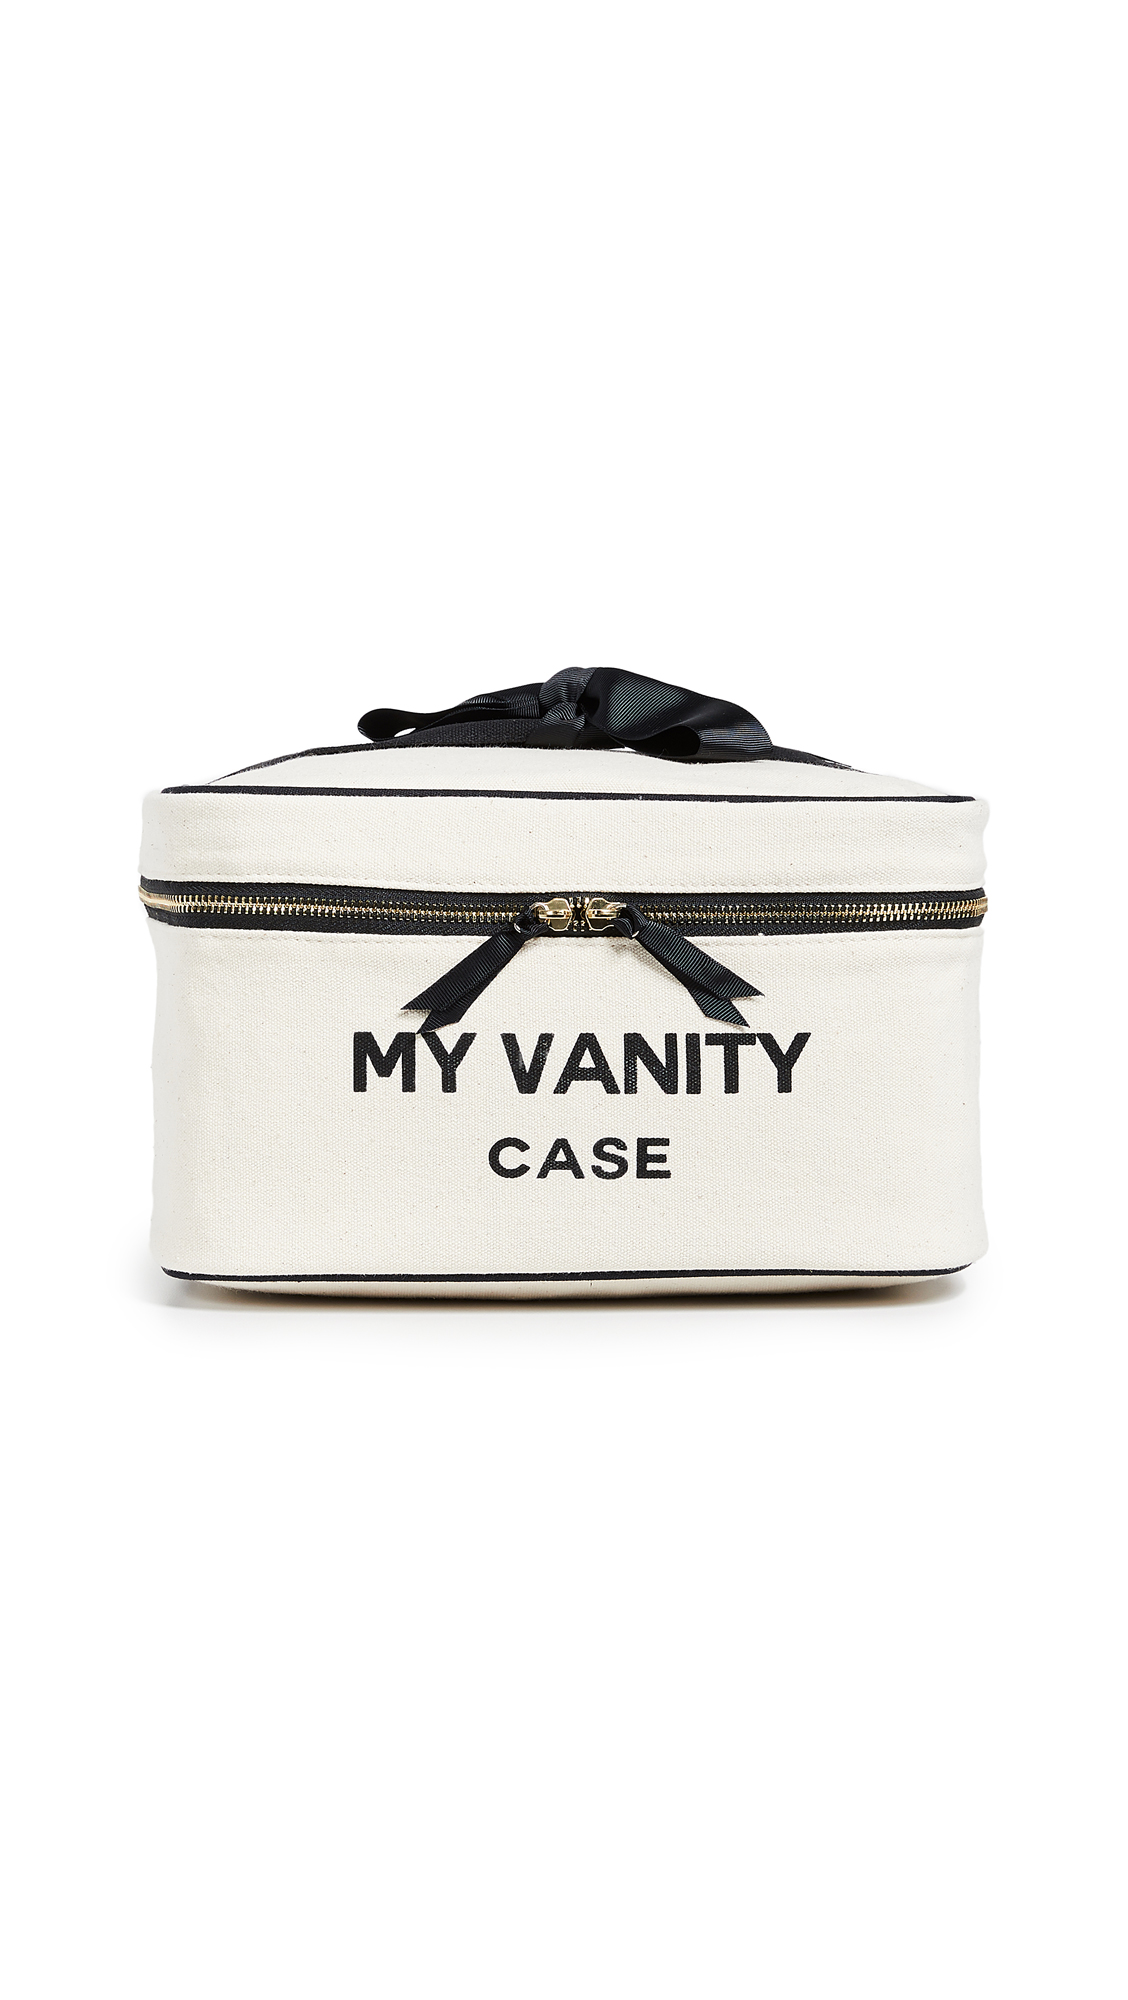 BAG-ALL My Vanity Travel Case in Natural/Black